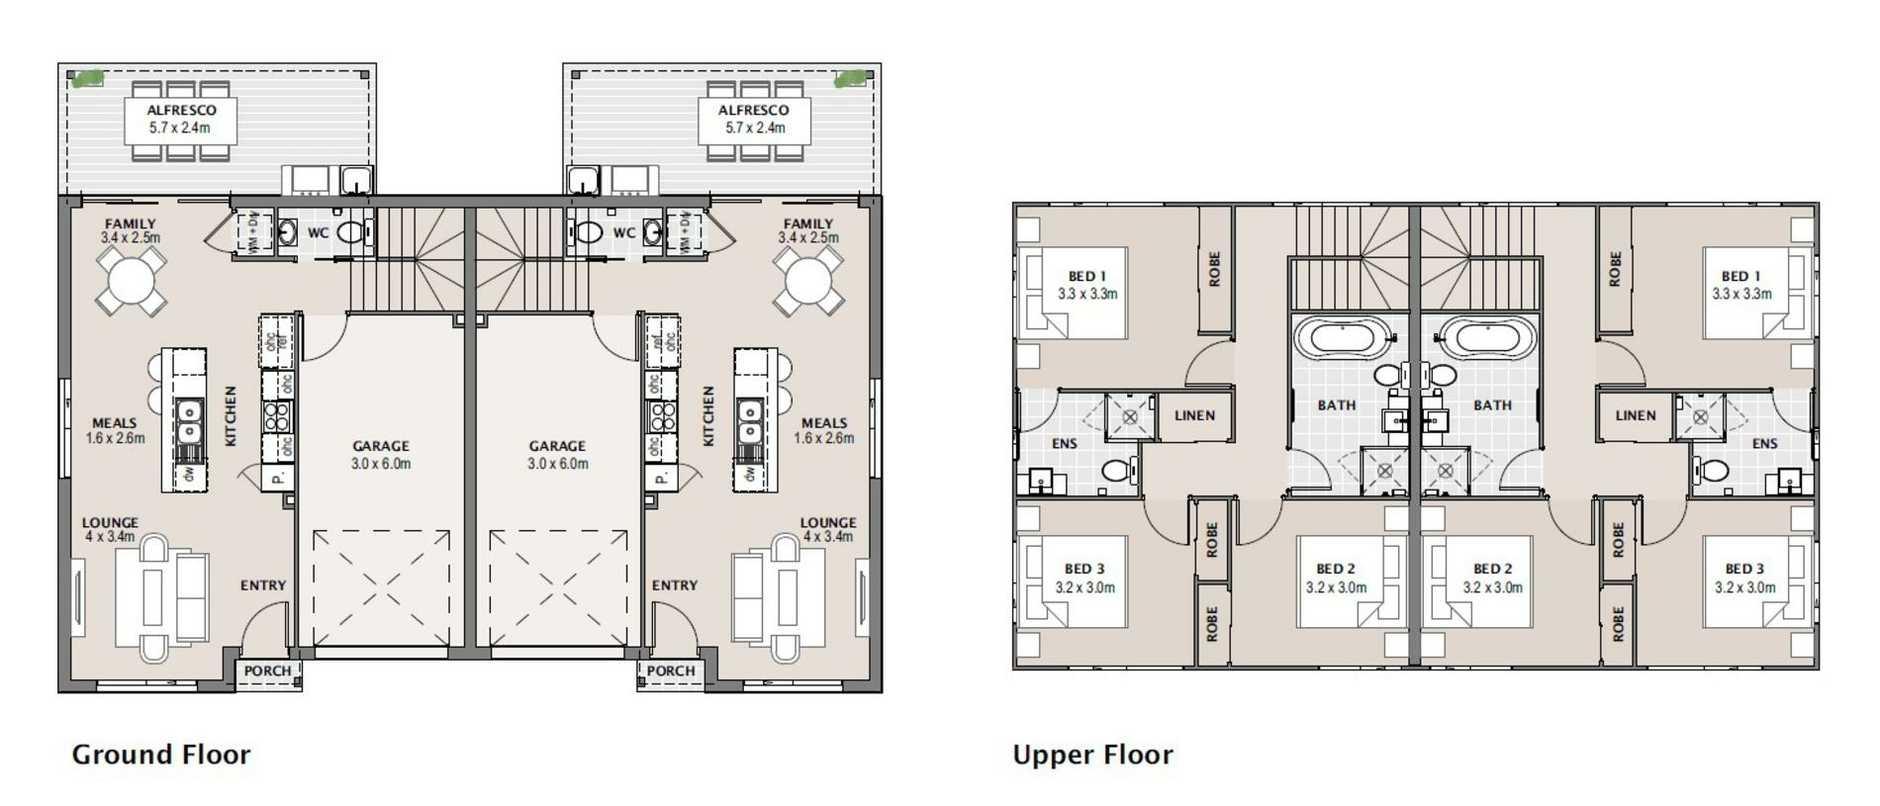 Floor plan of the Arthur St units.